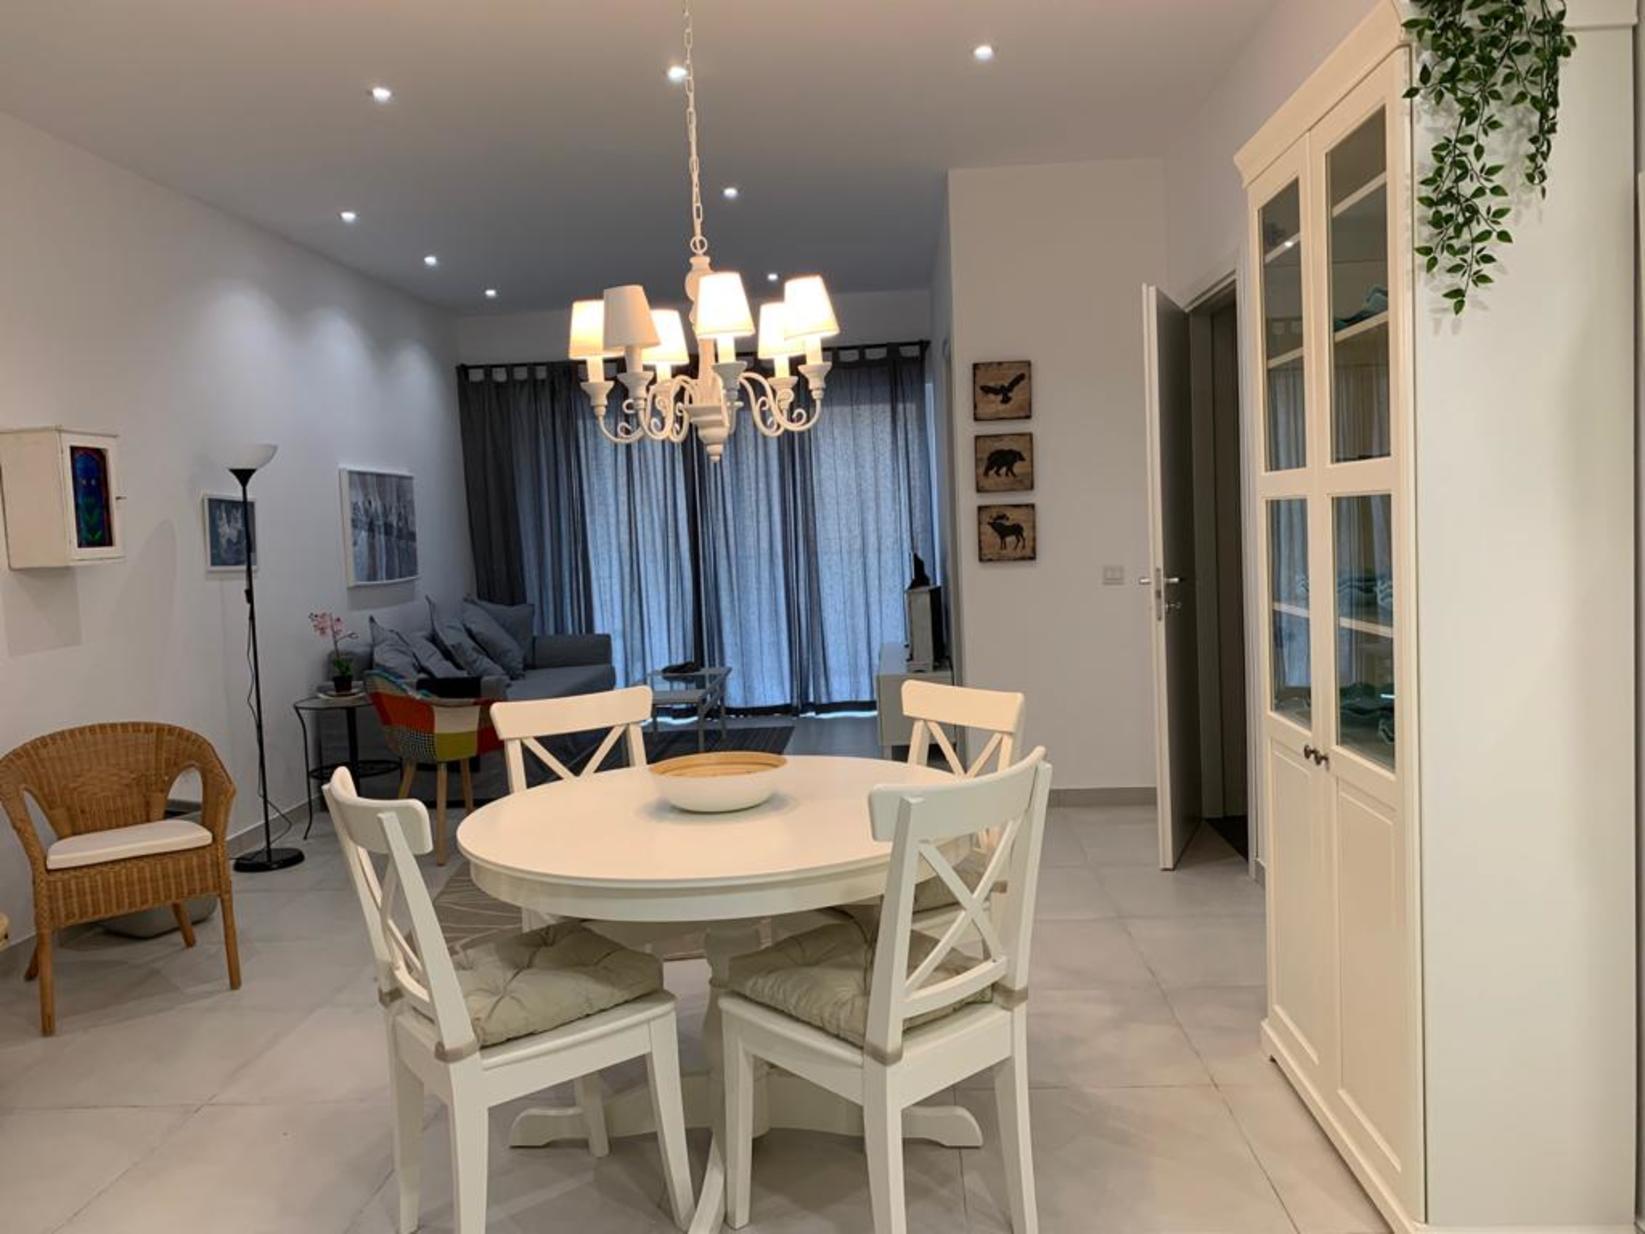 1 bed Apartment For Rent in Sliema, Sliema - thumb 15